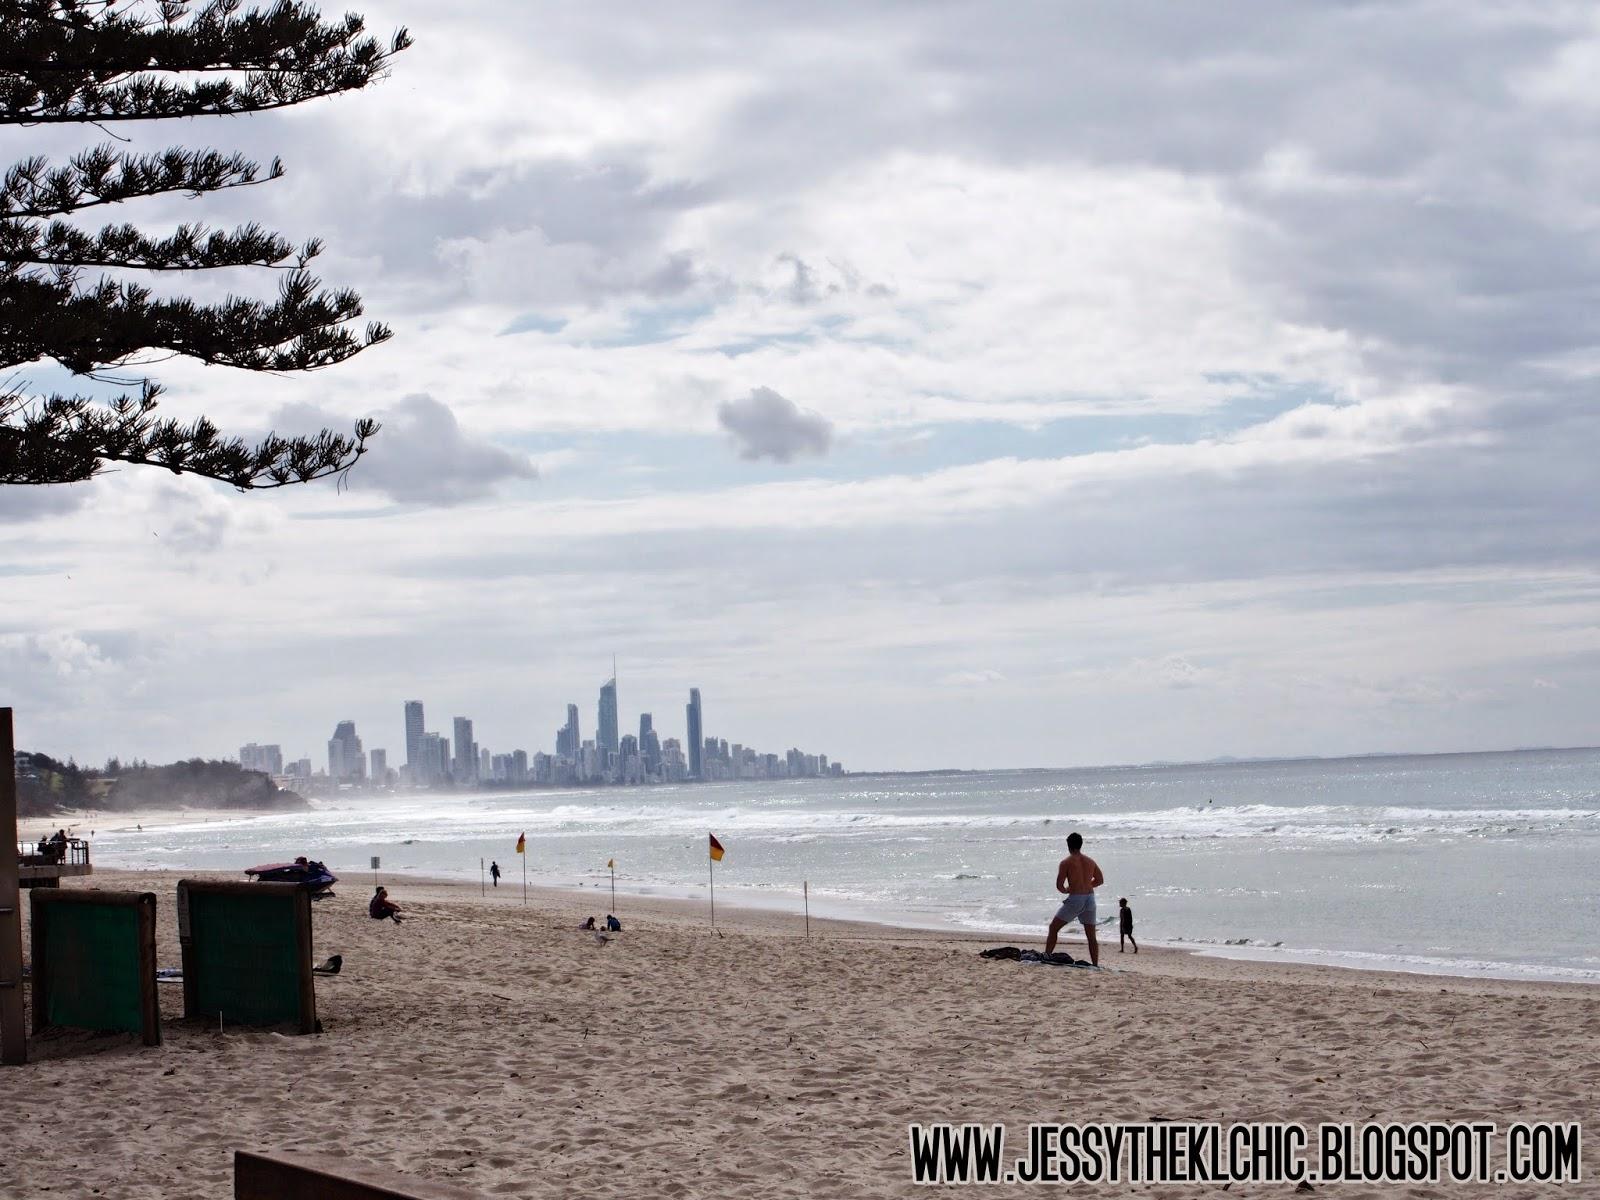 Travel: Burleigh Beach (Gold Coast, Australia)